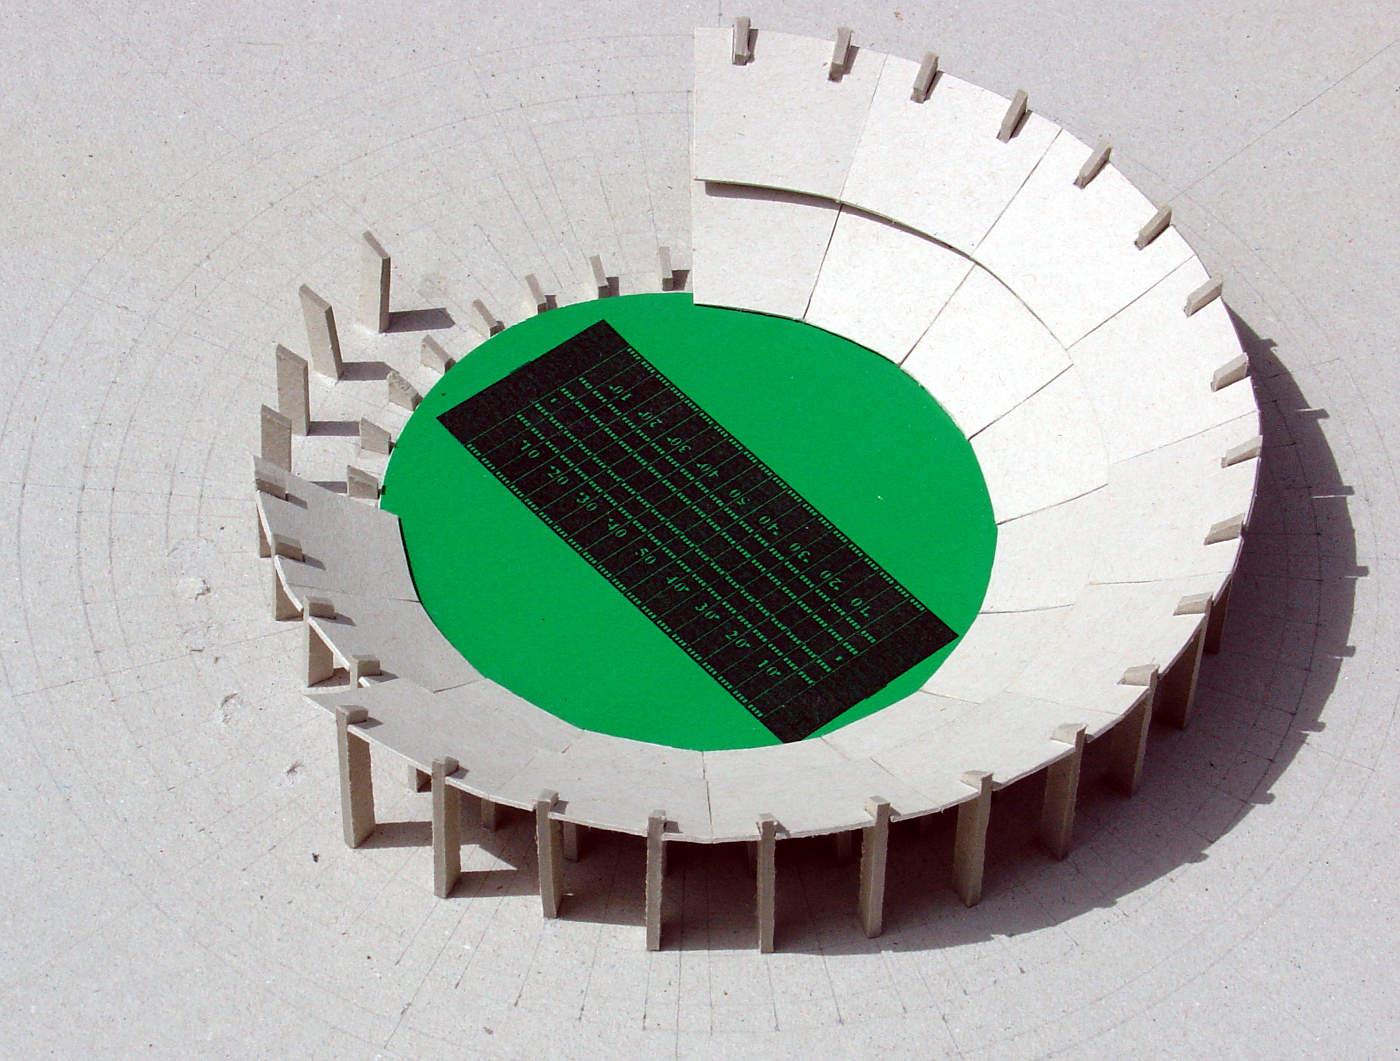 Idee voor rond stadion Los Angeles 1995